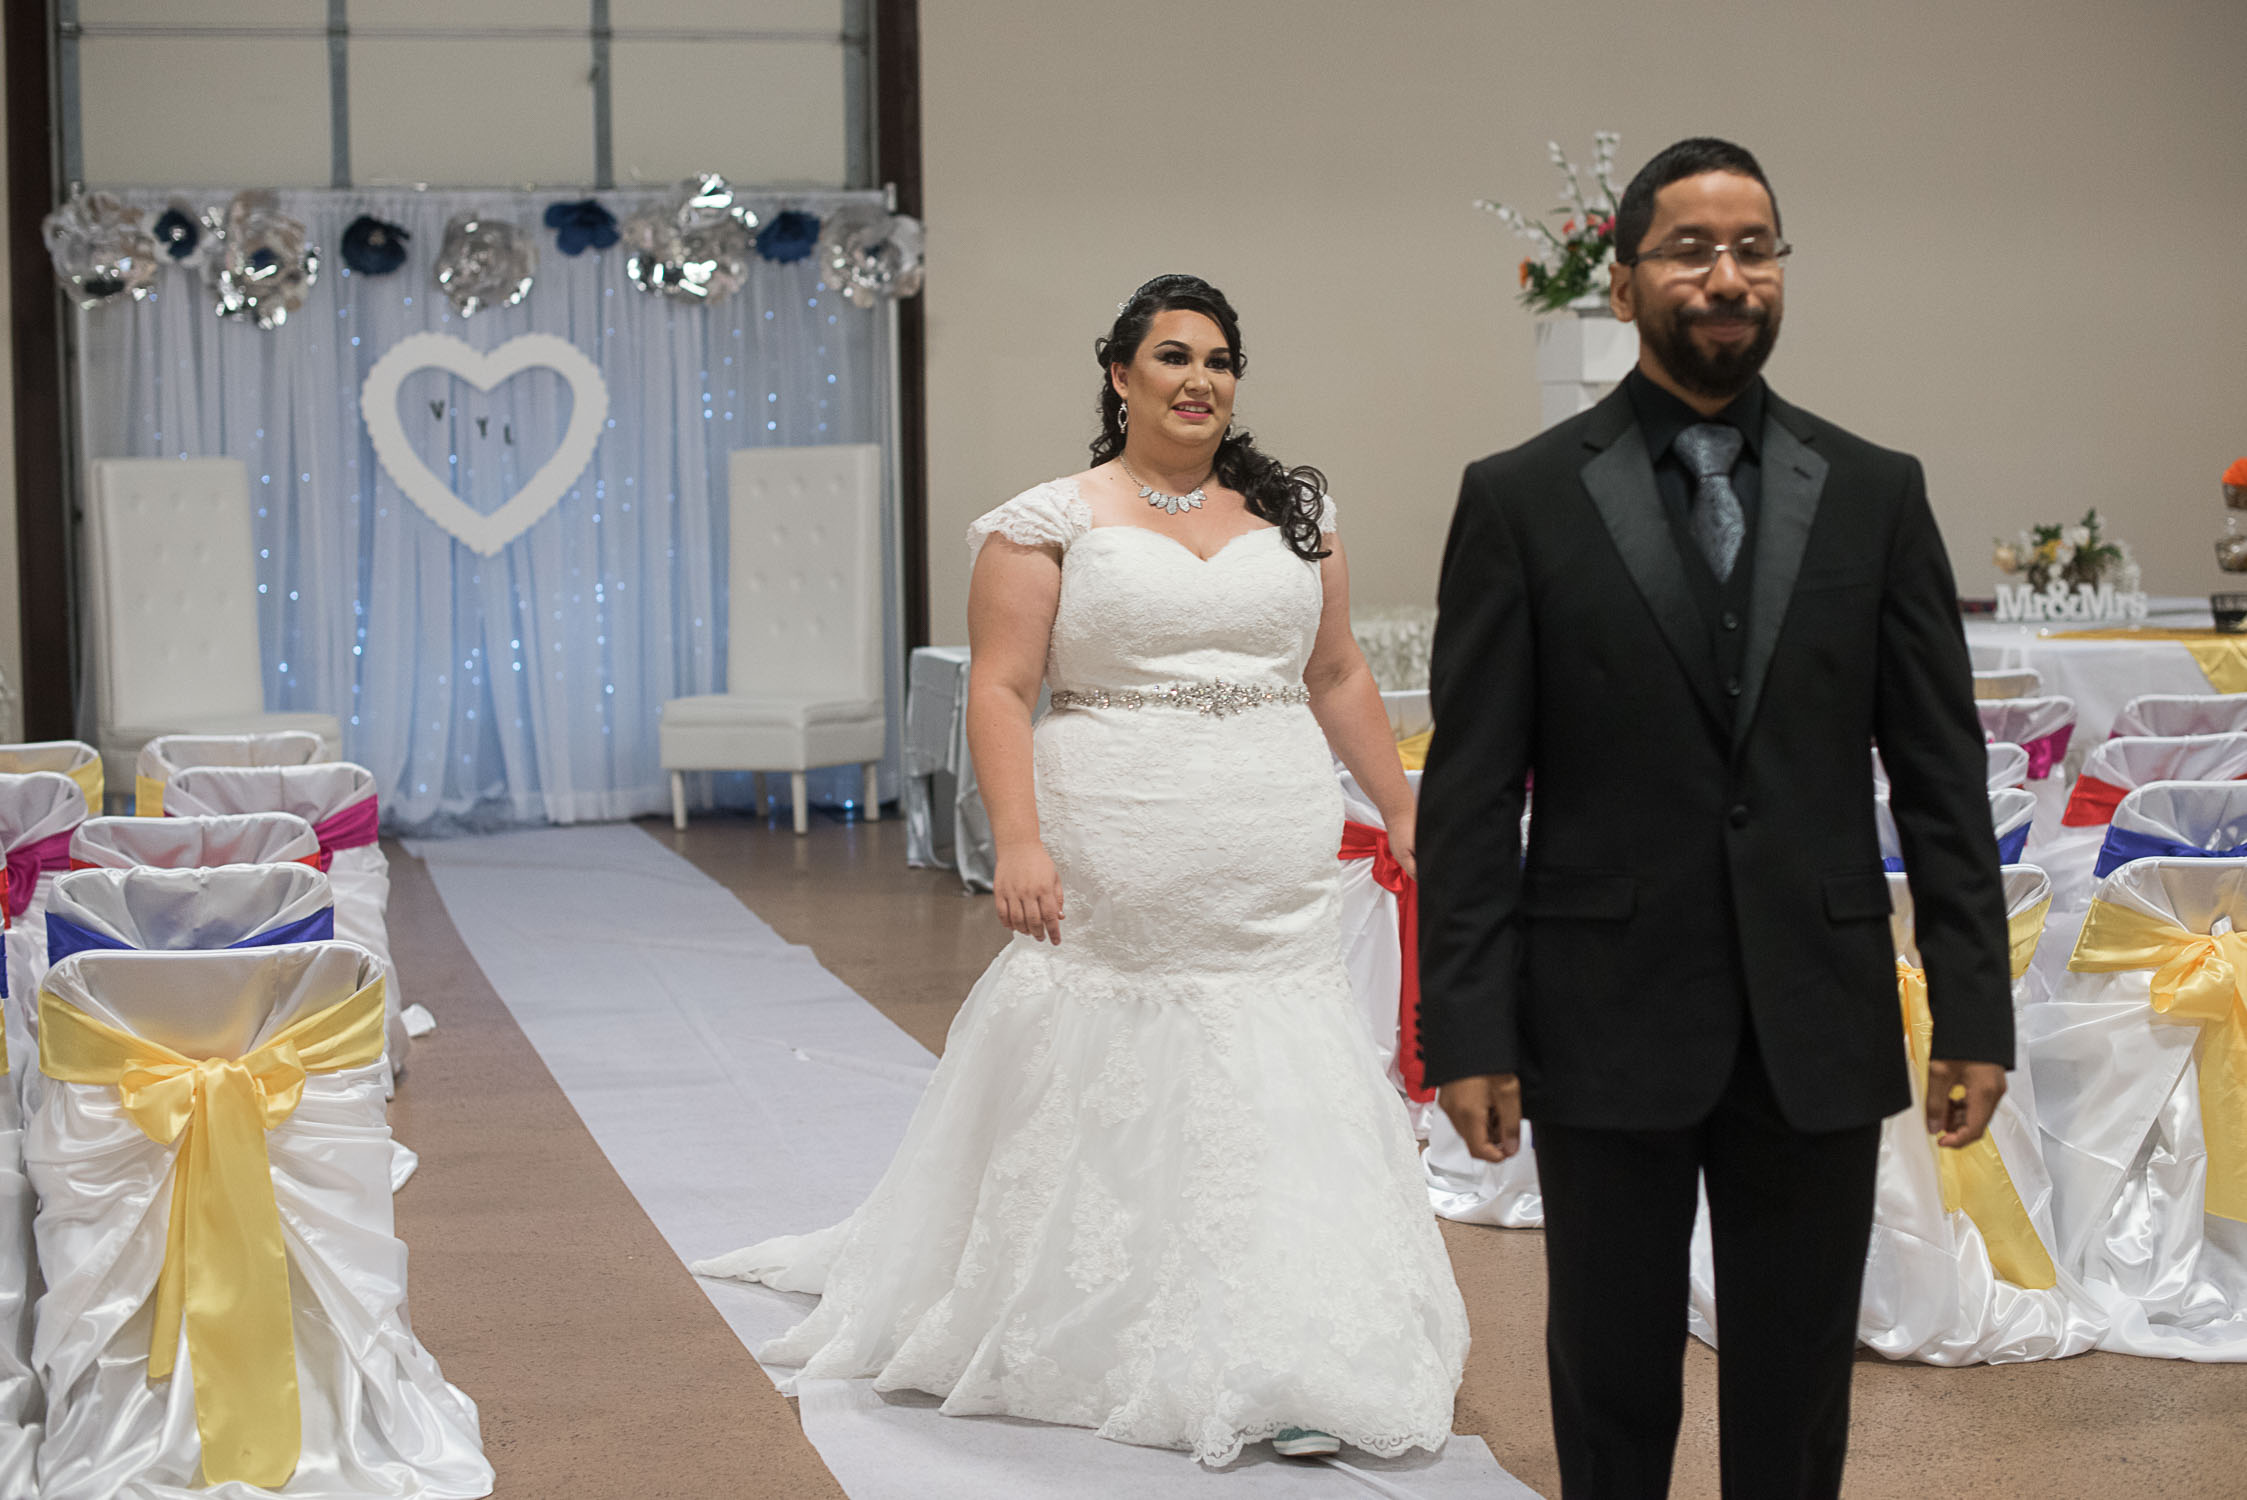 Leal Wedding Mira Visu Photography-71.jpg